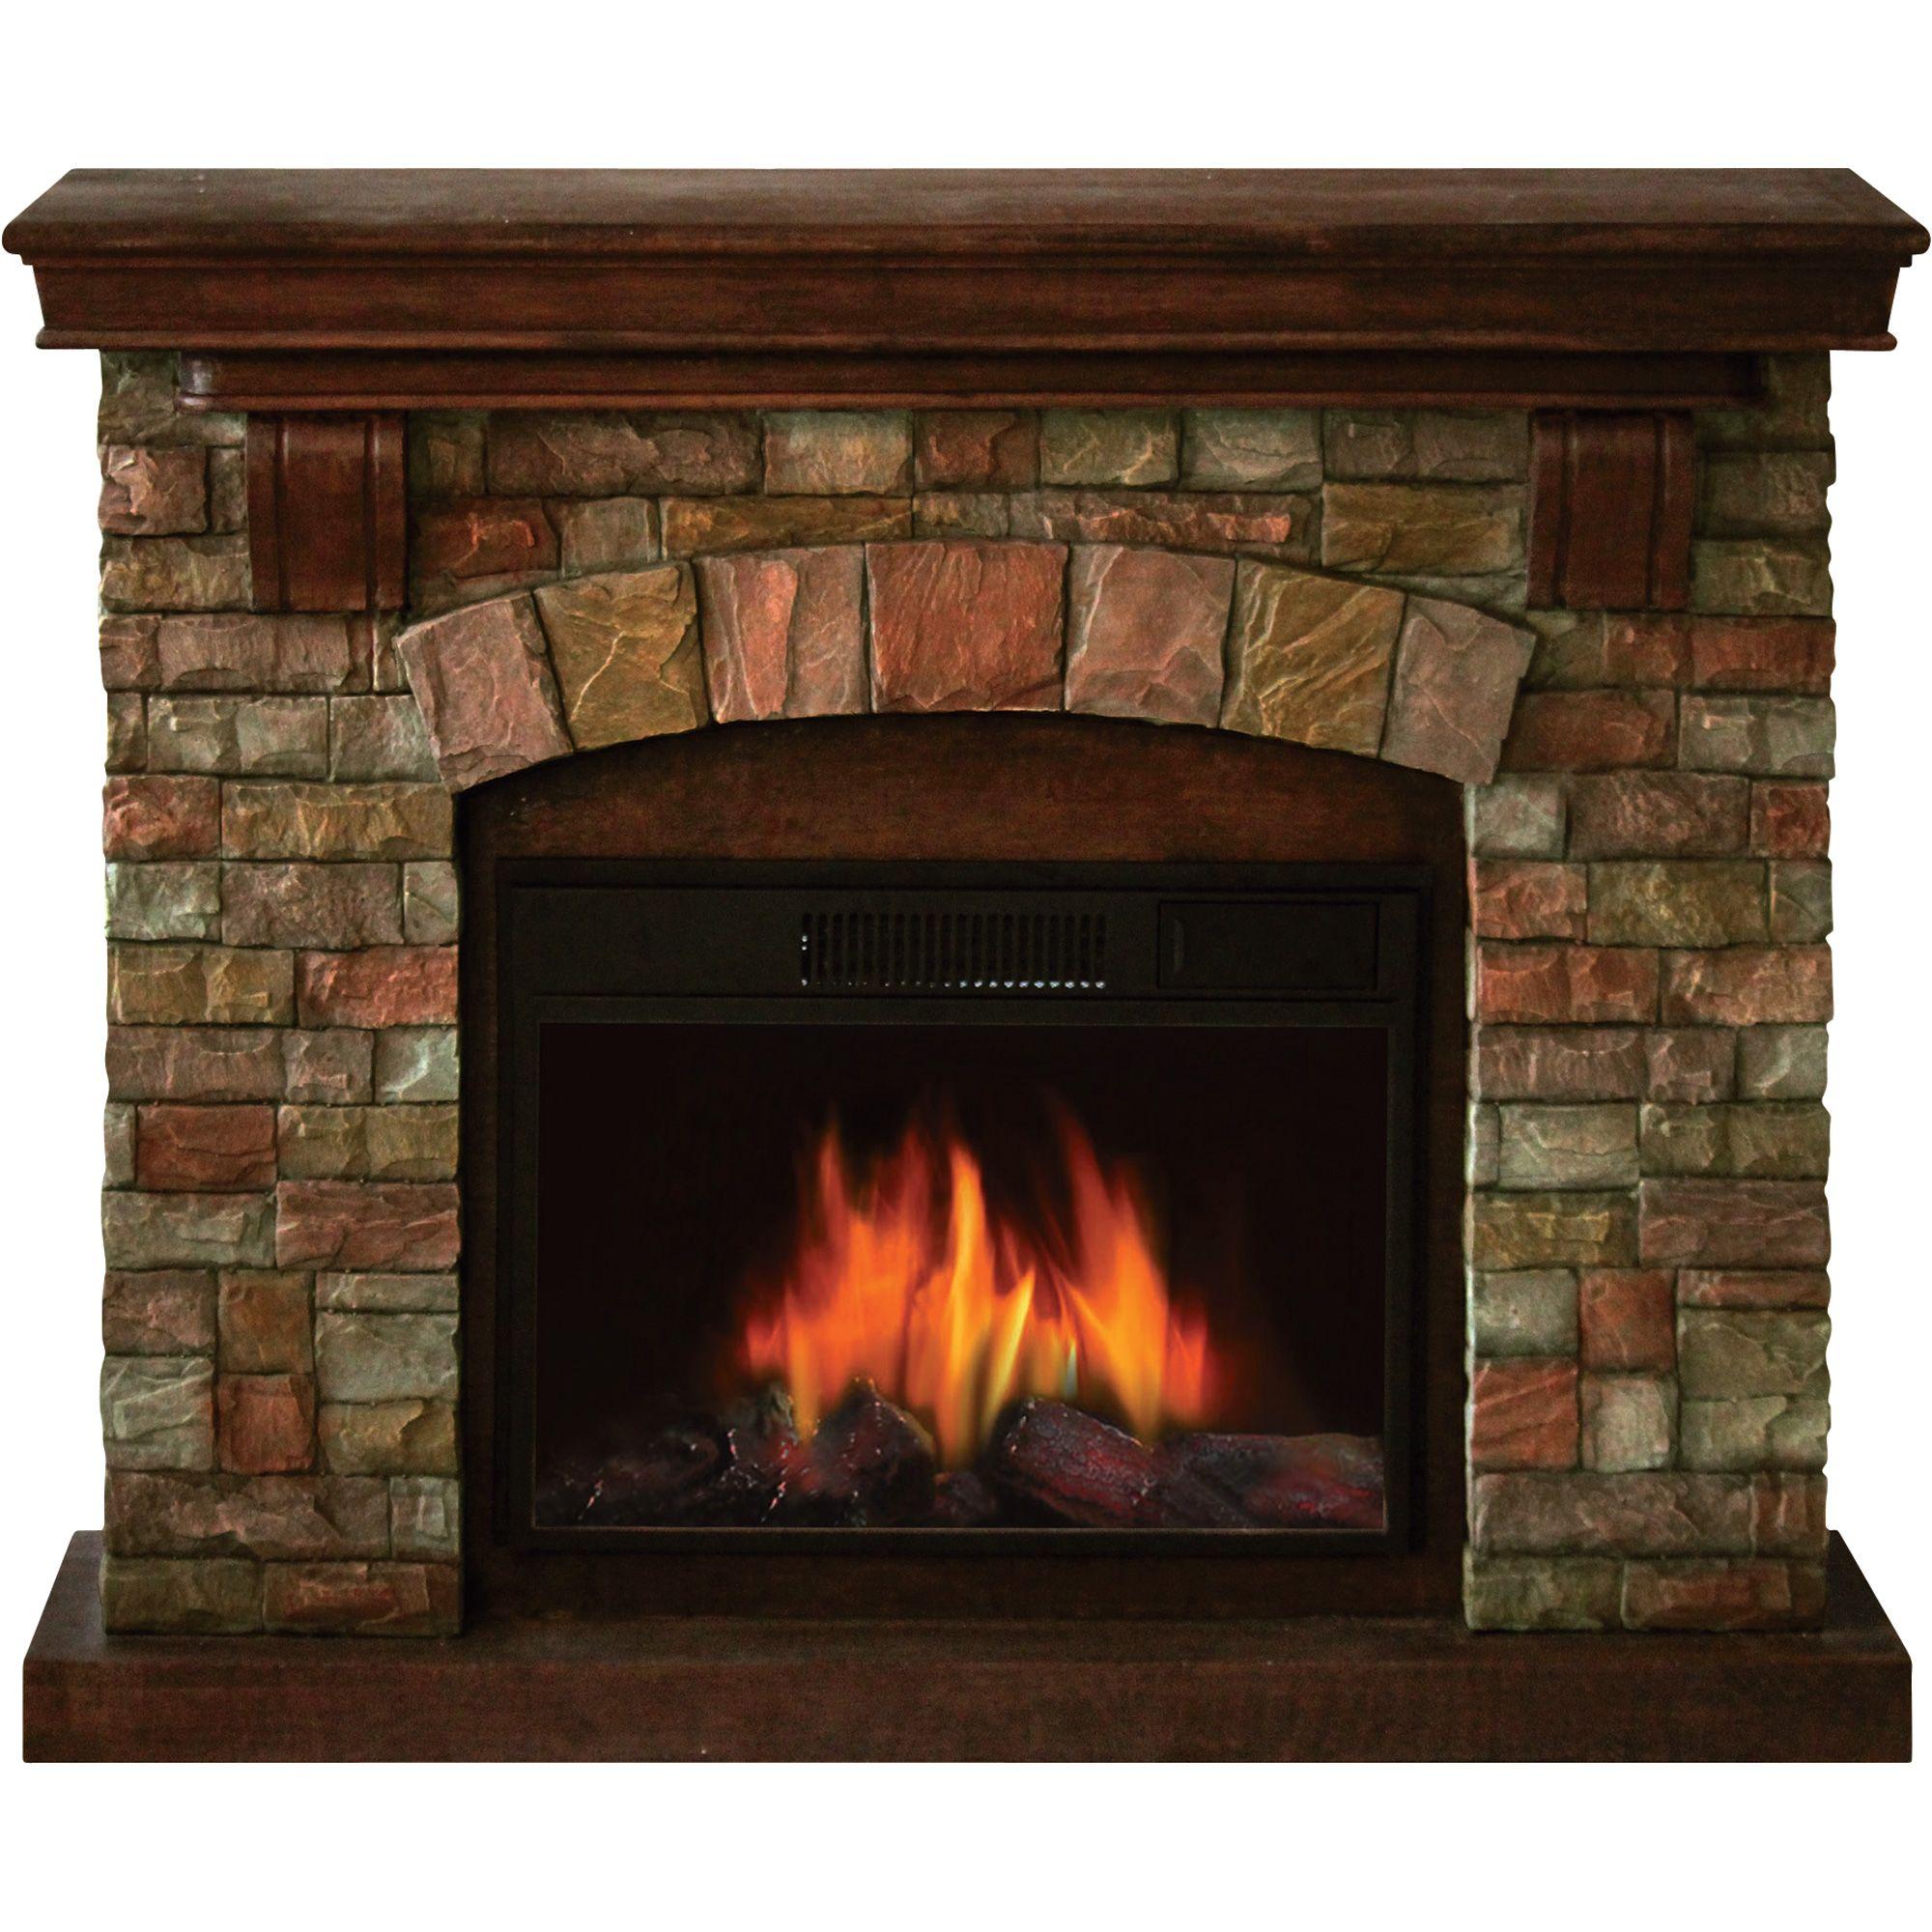 Stonegate Malibu Electric Fireplace 5100 Btu Model